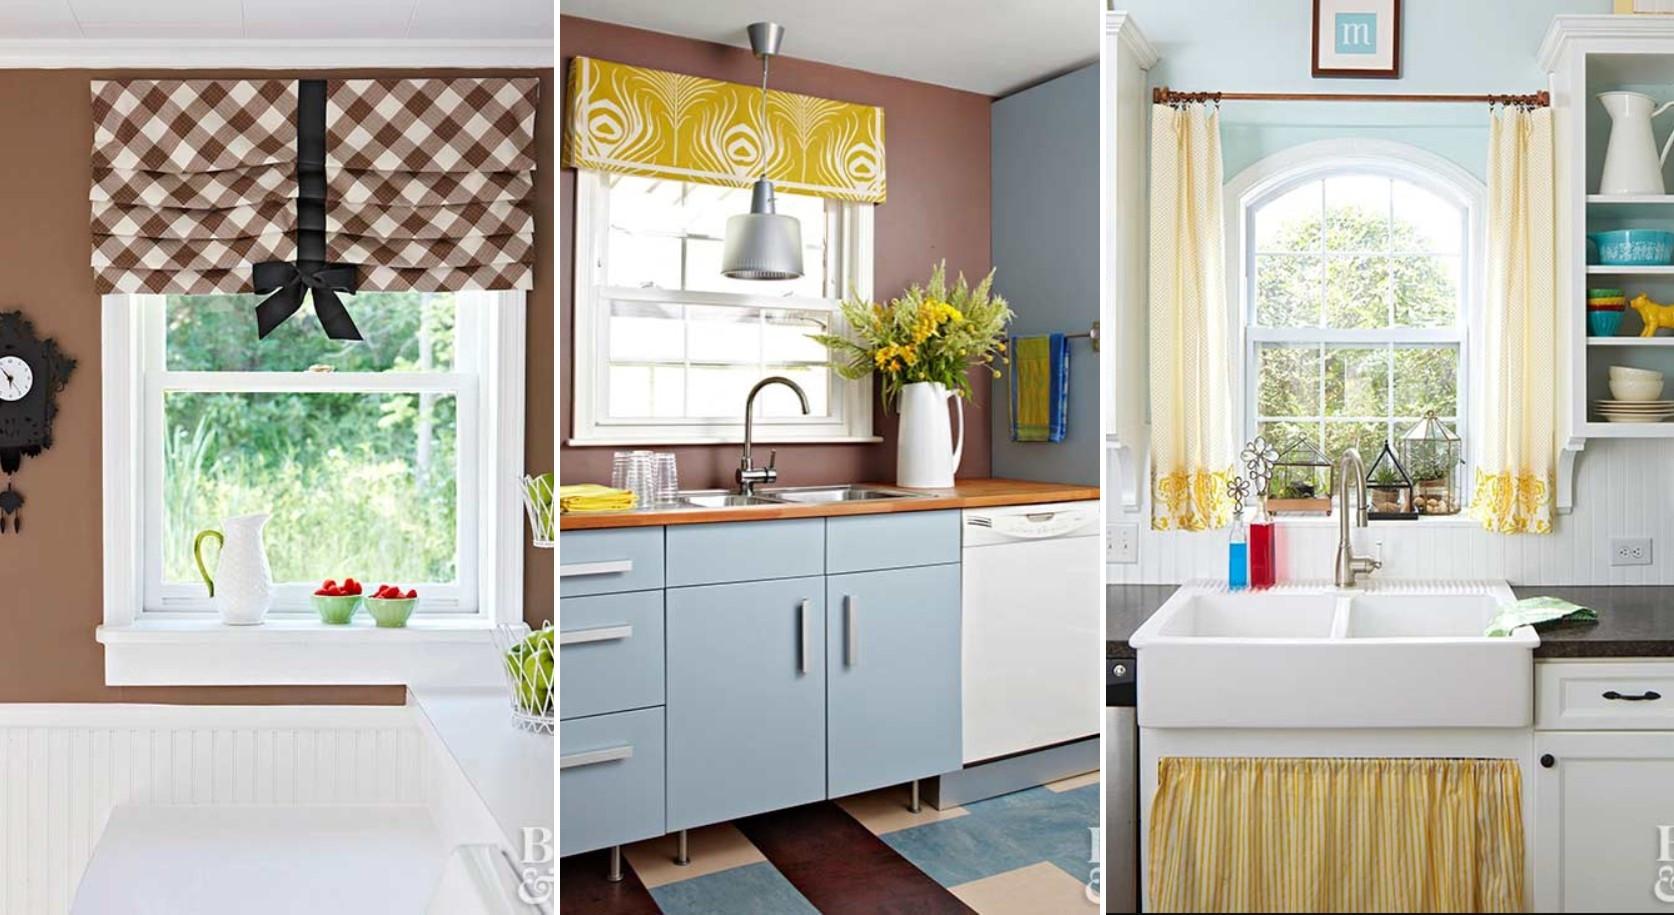 Best ideas about Kitchen Window Treatments DIY . Save or Pin DIY Kitchen Window Treatments Ideas to Love Now.